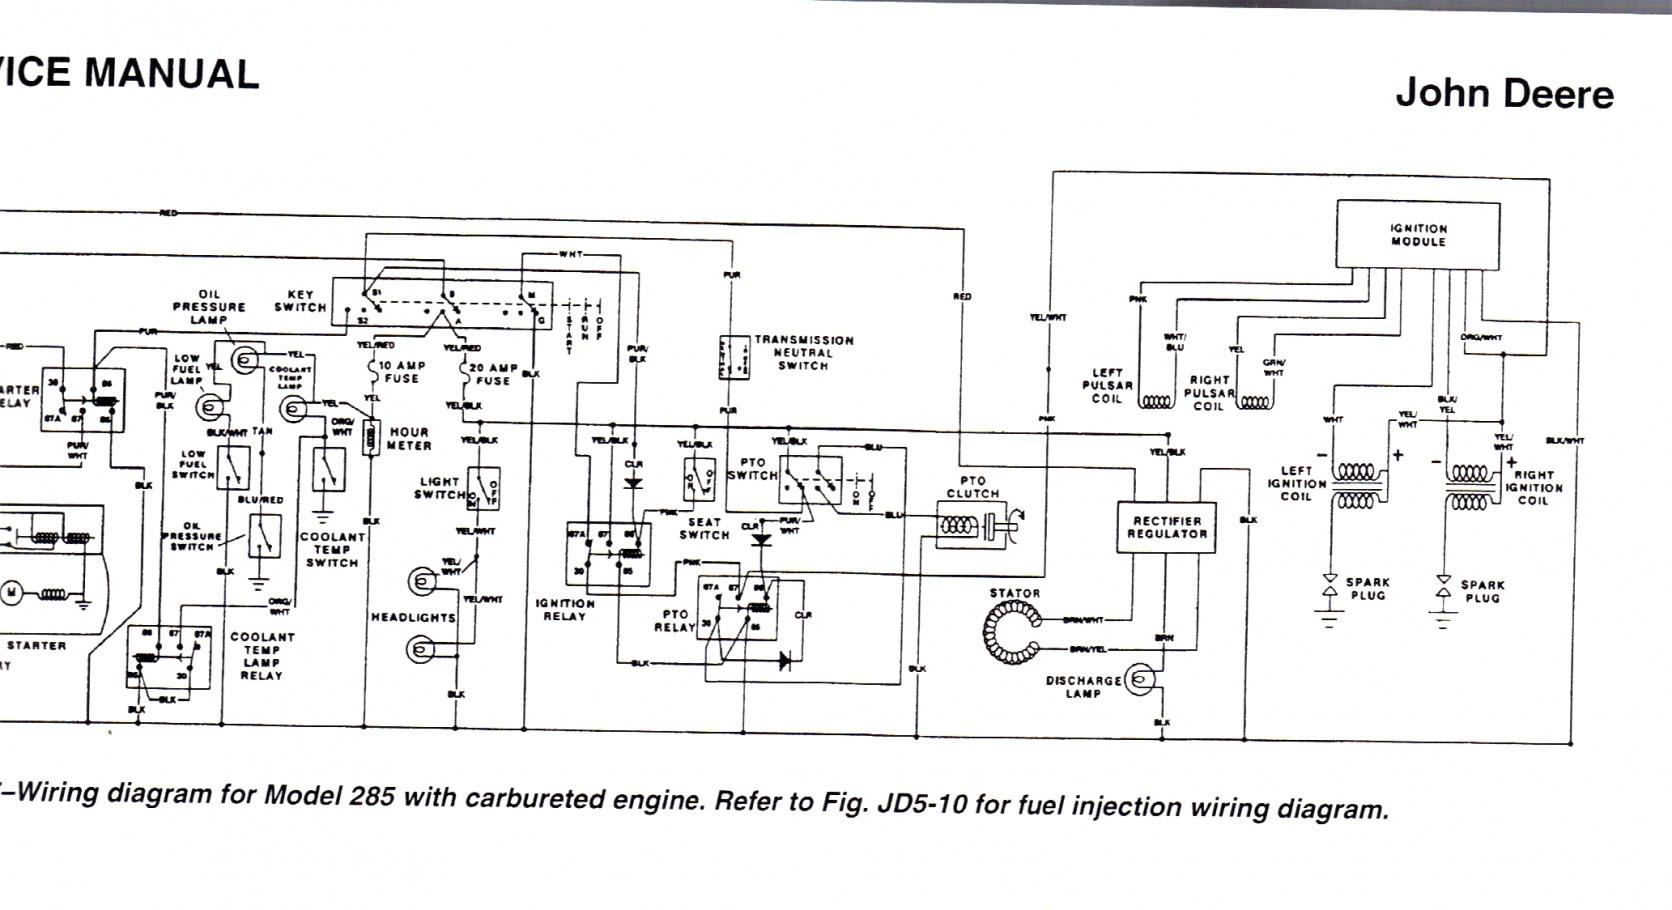 John Deere Fuse Box   Wiring Diagram - John Deere Wiring Diagram